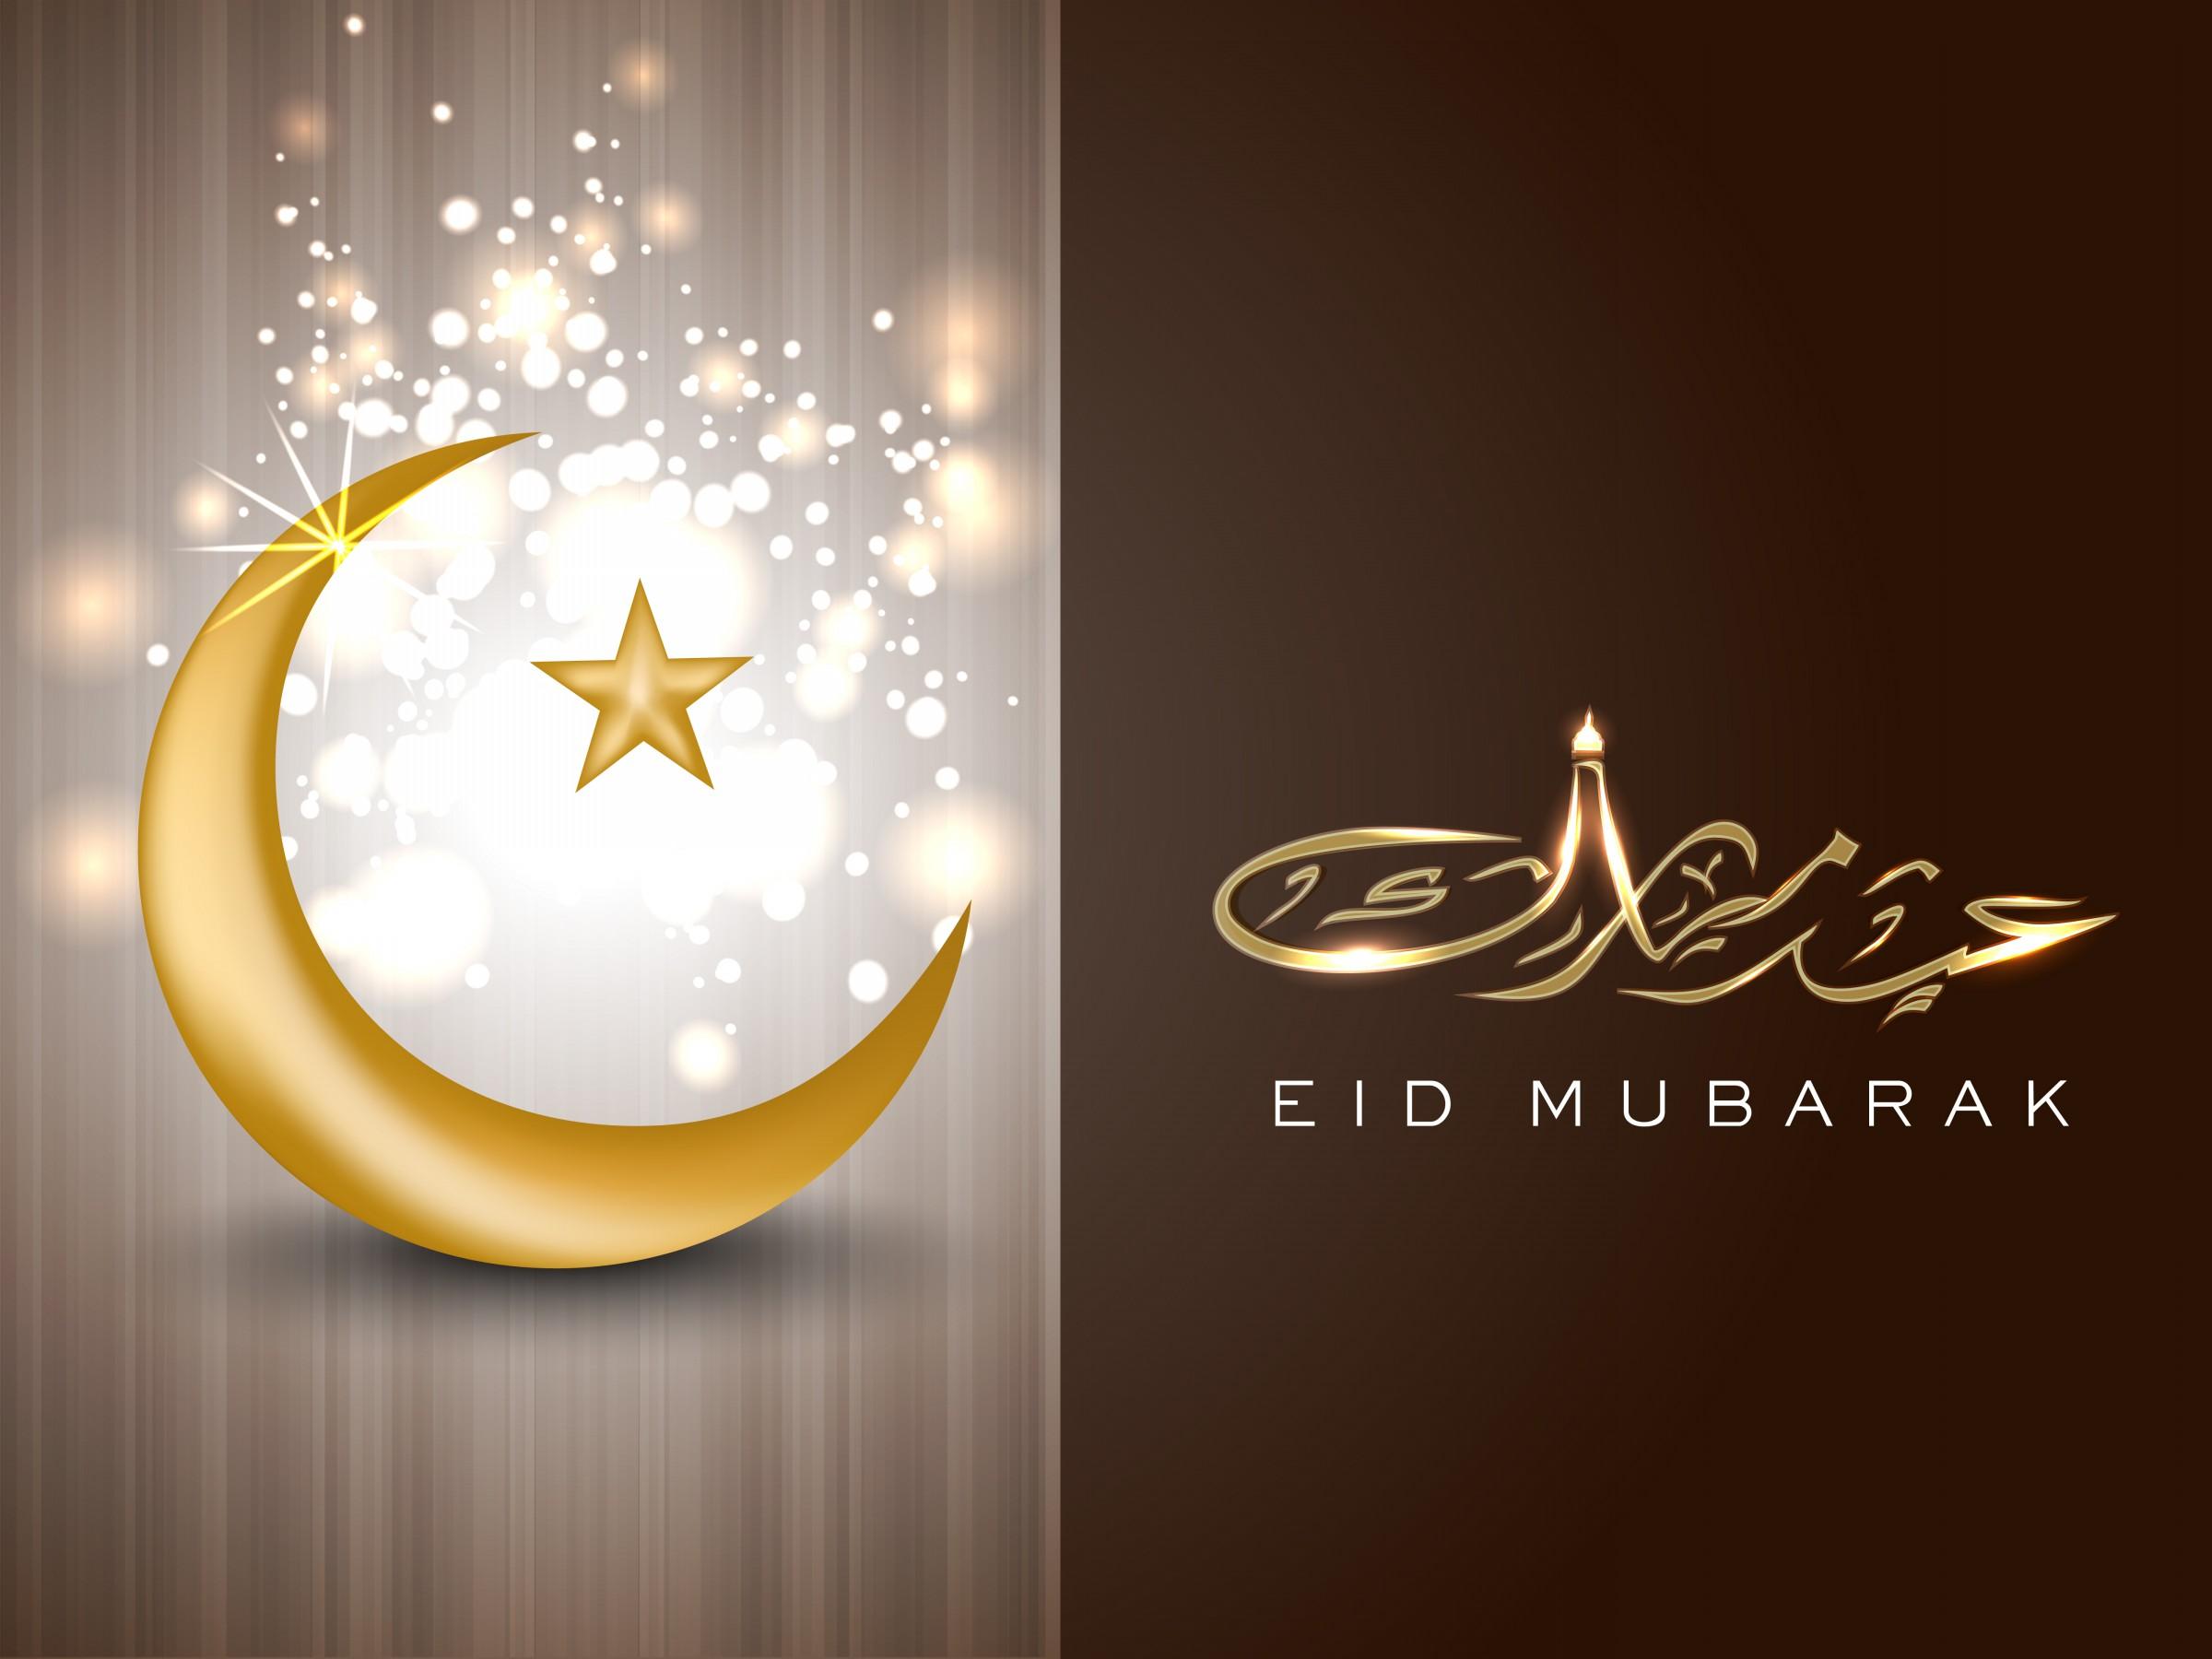 Eid celebrations in Hyderabad